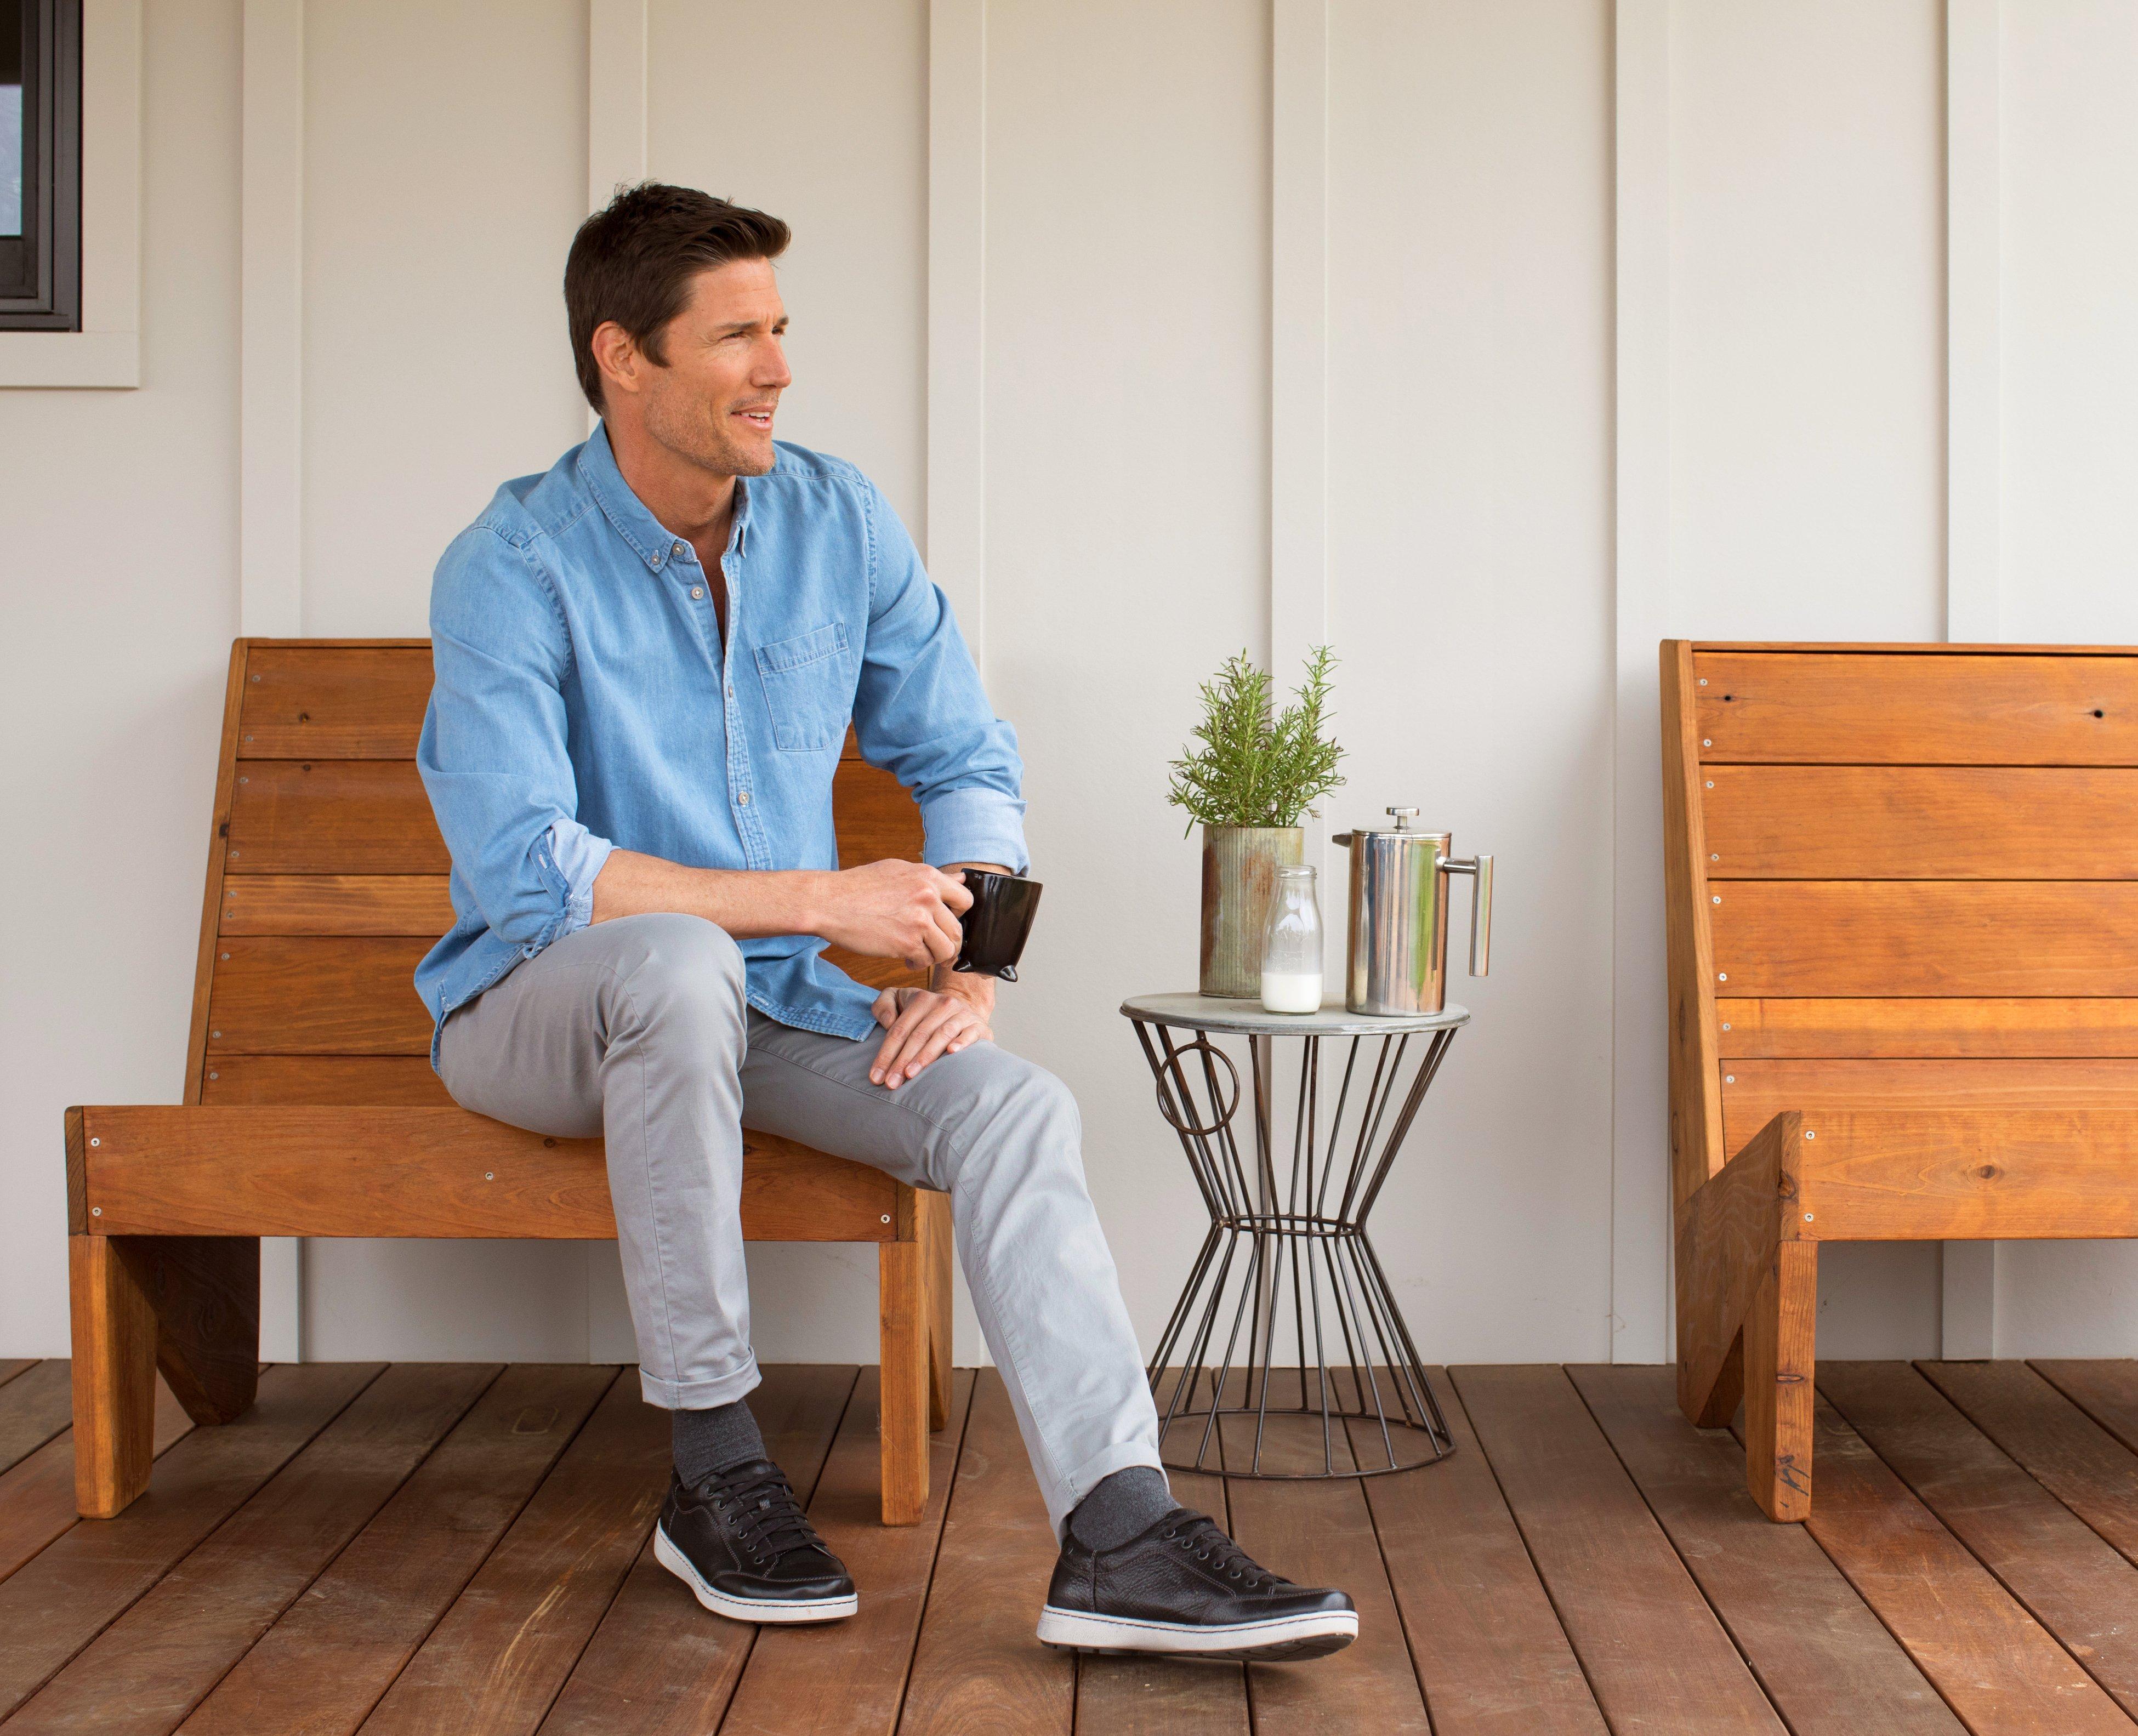 Clickable Image of a man sitting down wearing Dansko Sneakers